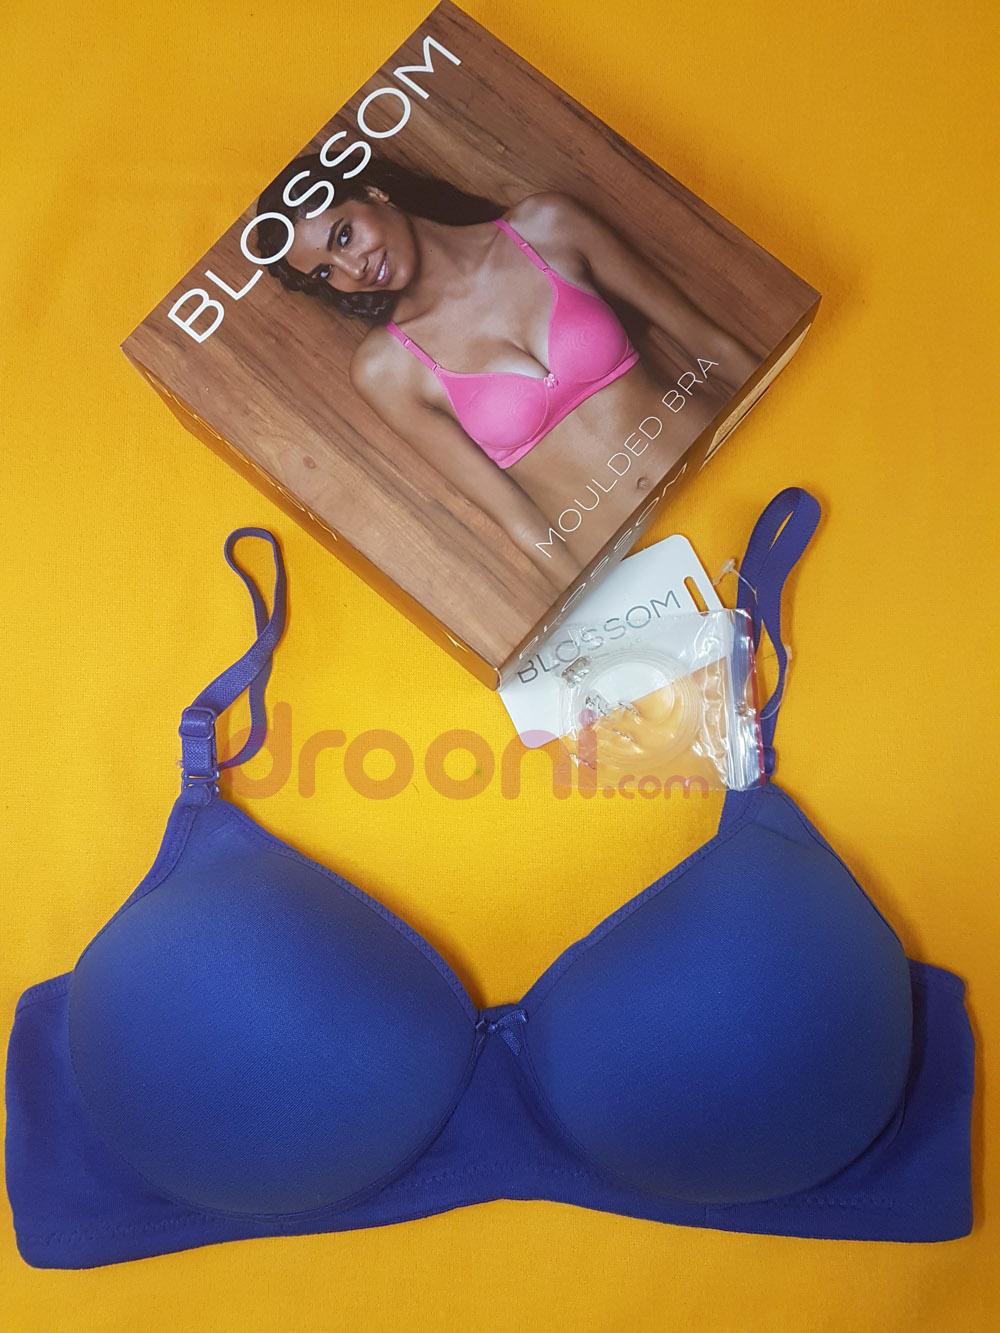 4588ad2076 Blossom Push Up Bra - Drooni.com